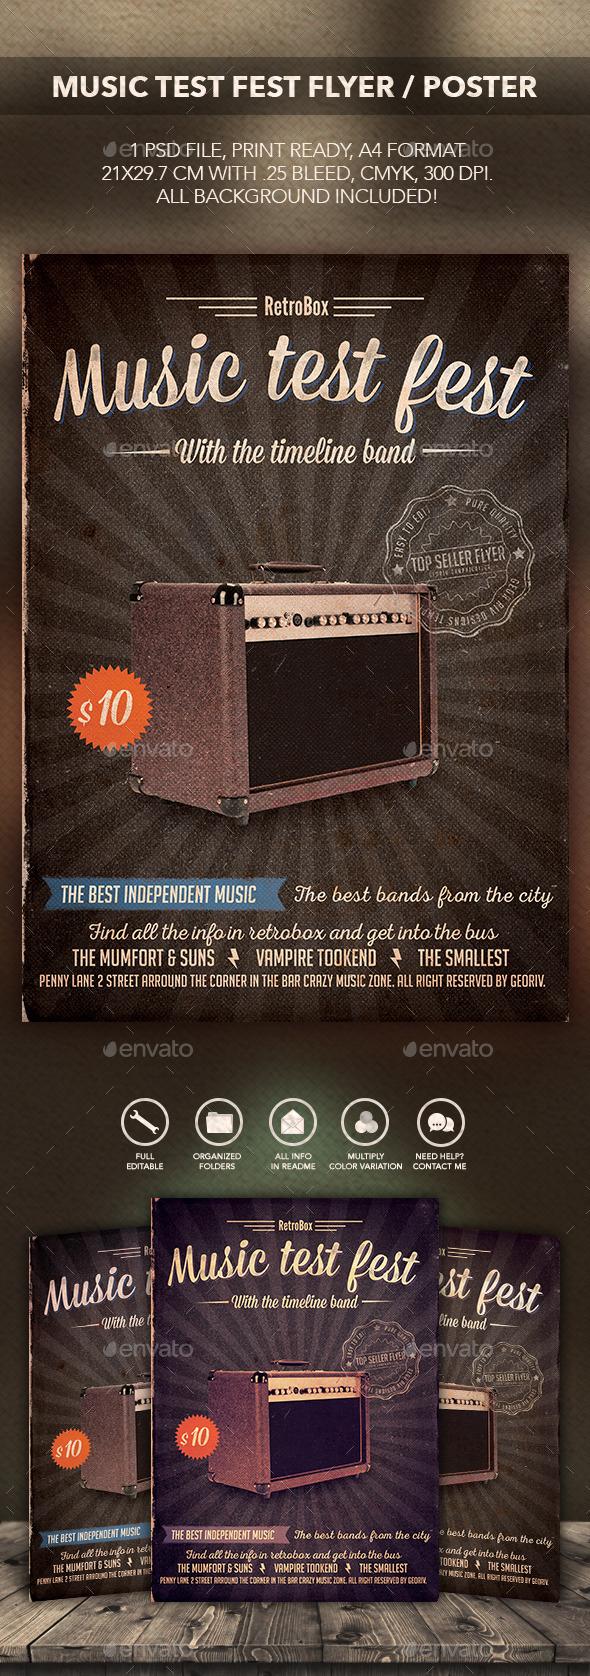 Music Test Fest Flyer - Flyers Print Templates